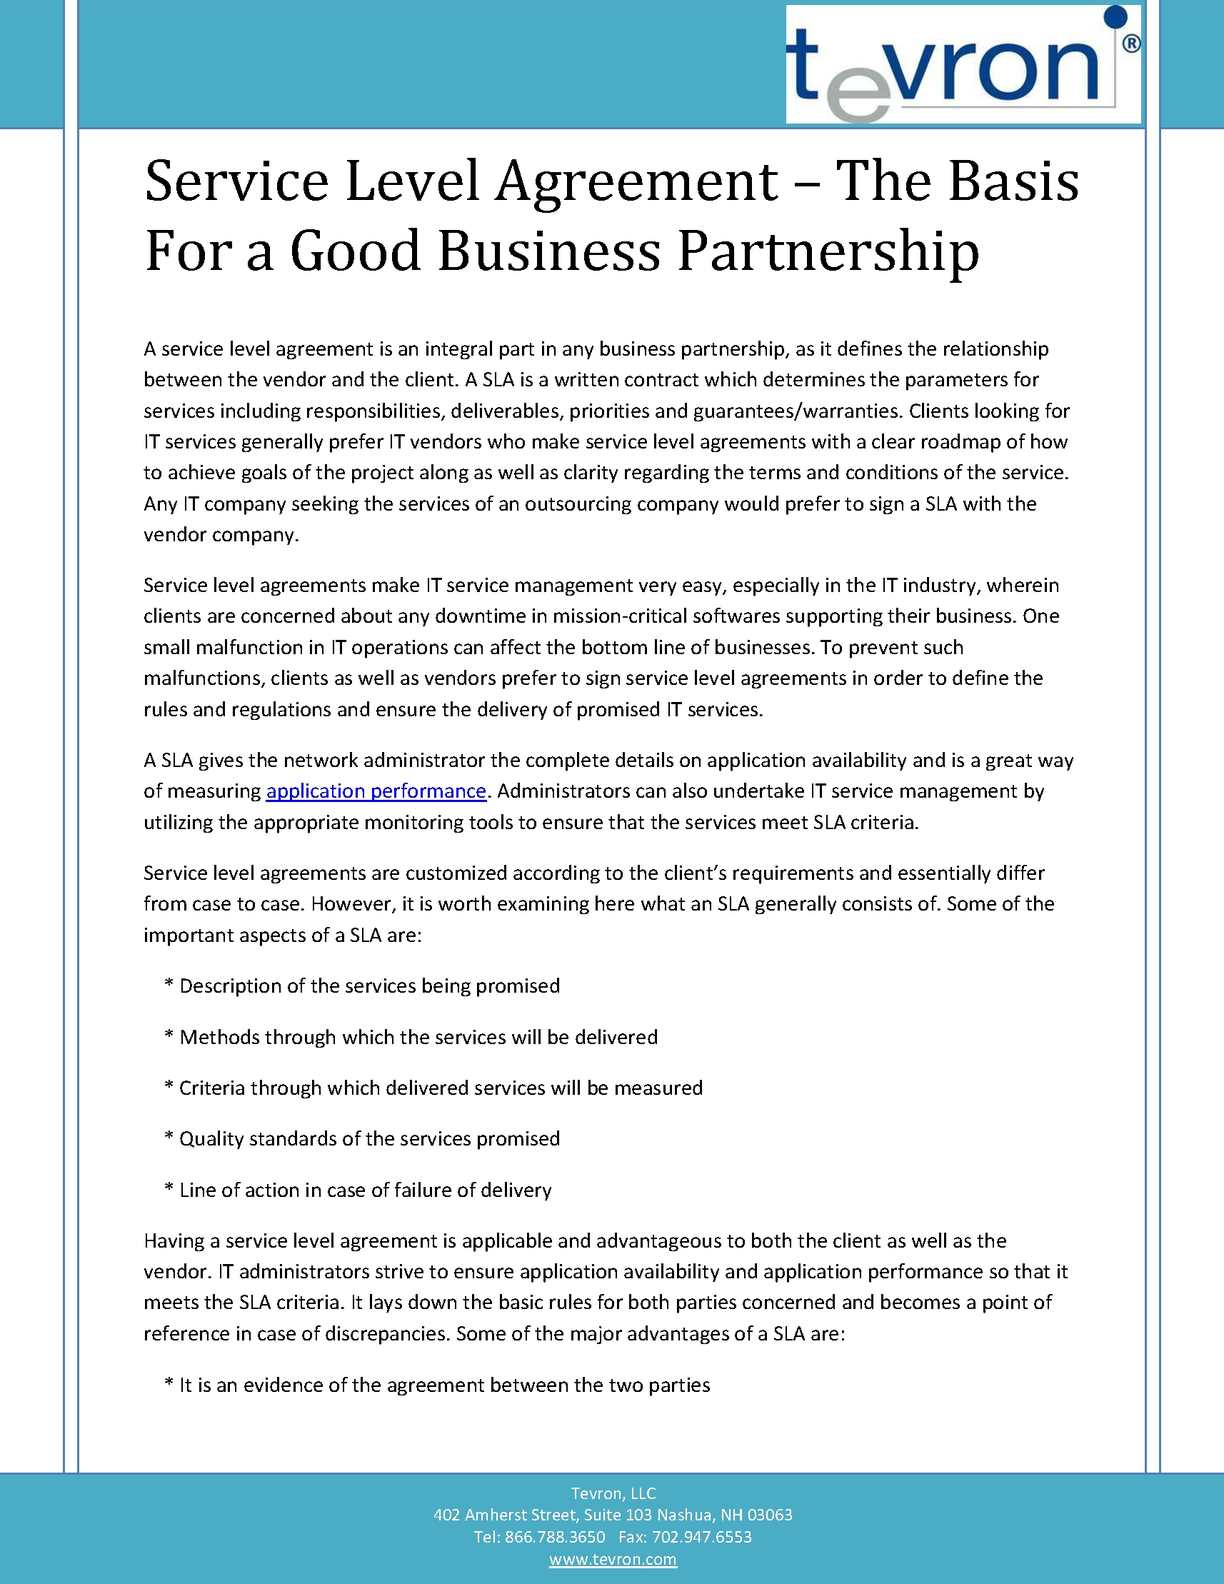 Business Agreements Sample Vendor Confidentiality Agreement Basic P1  Business Agreements Sample Vendor Confidentiality Agreement Html